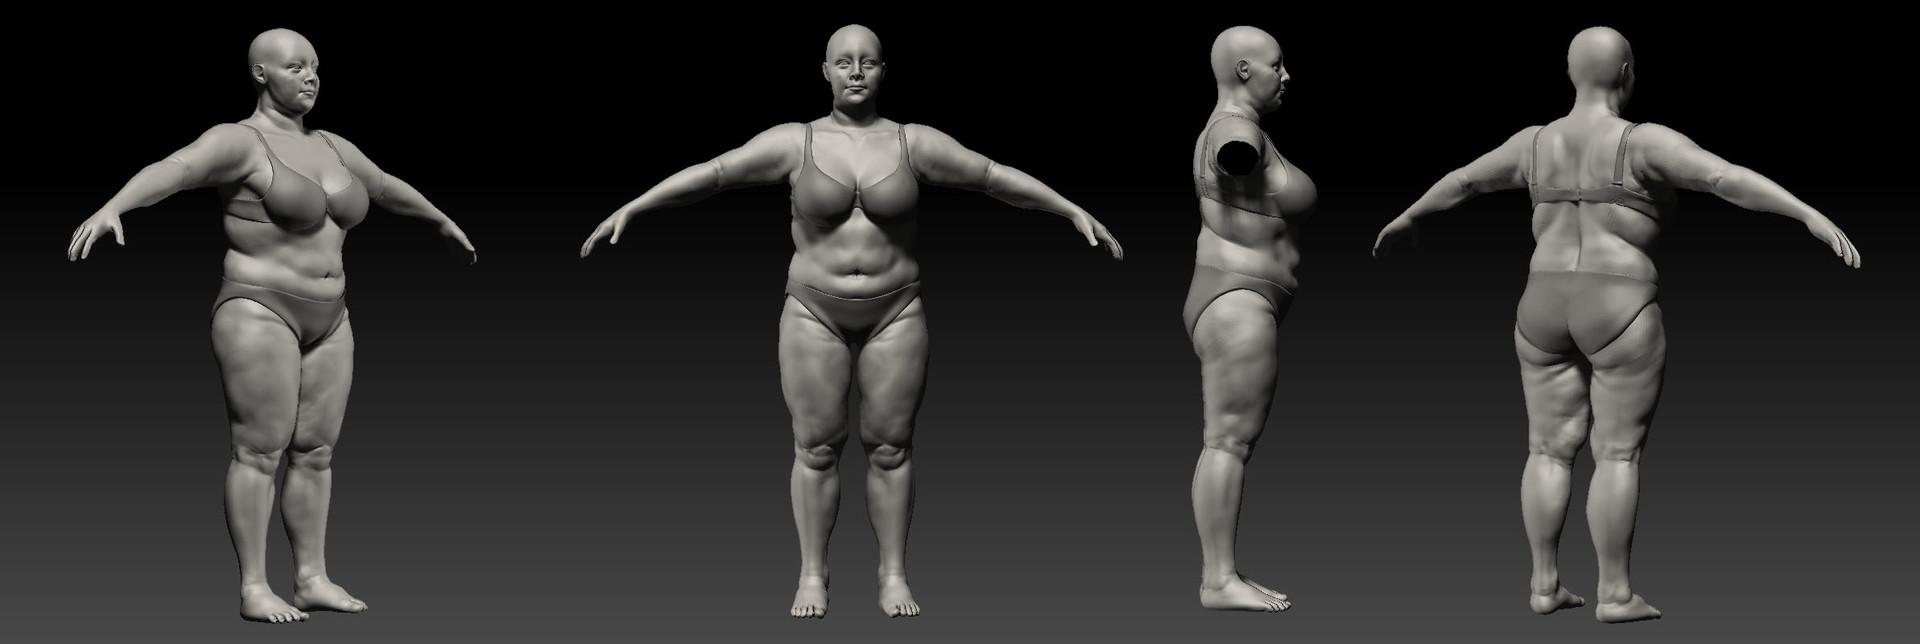 Jin hao villa overweight woman